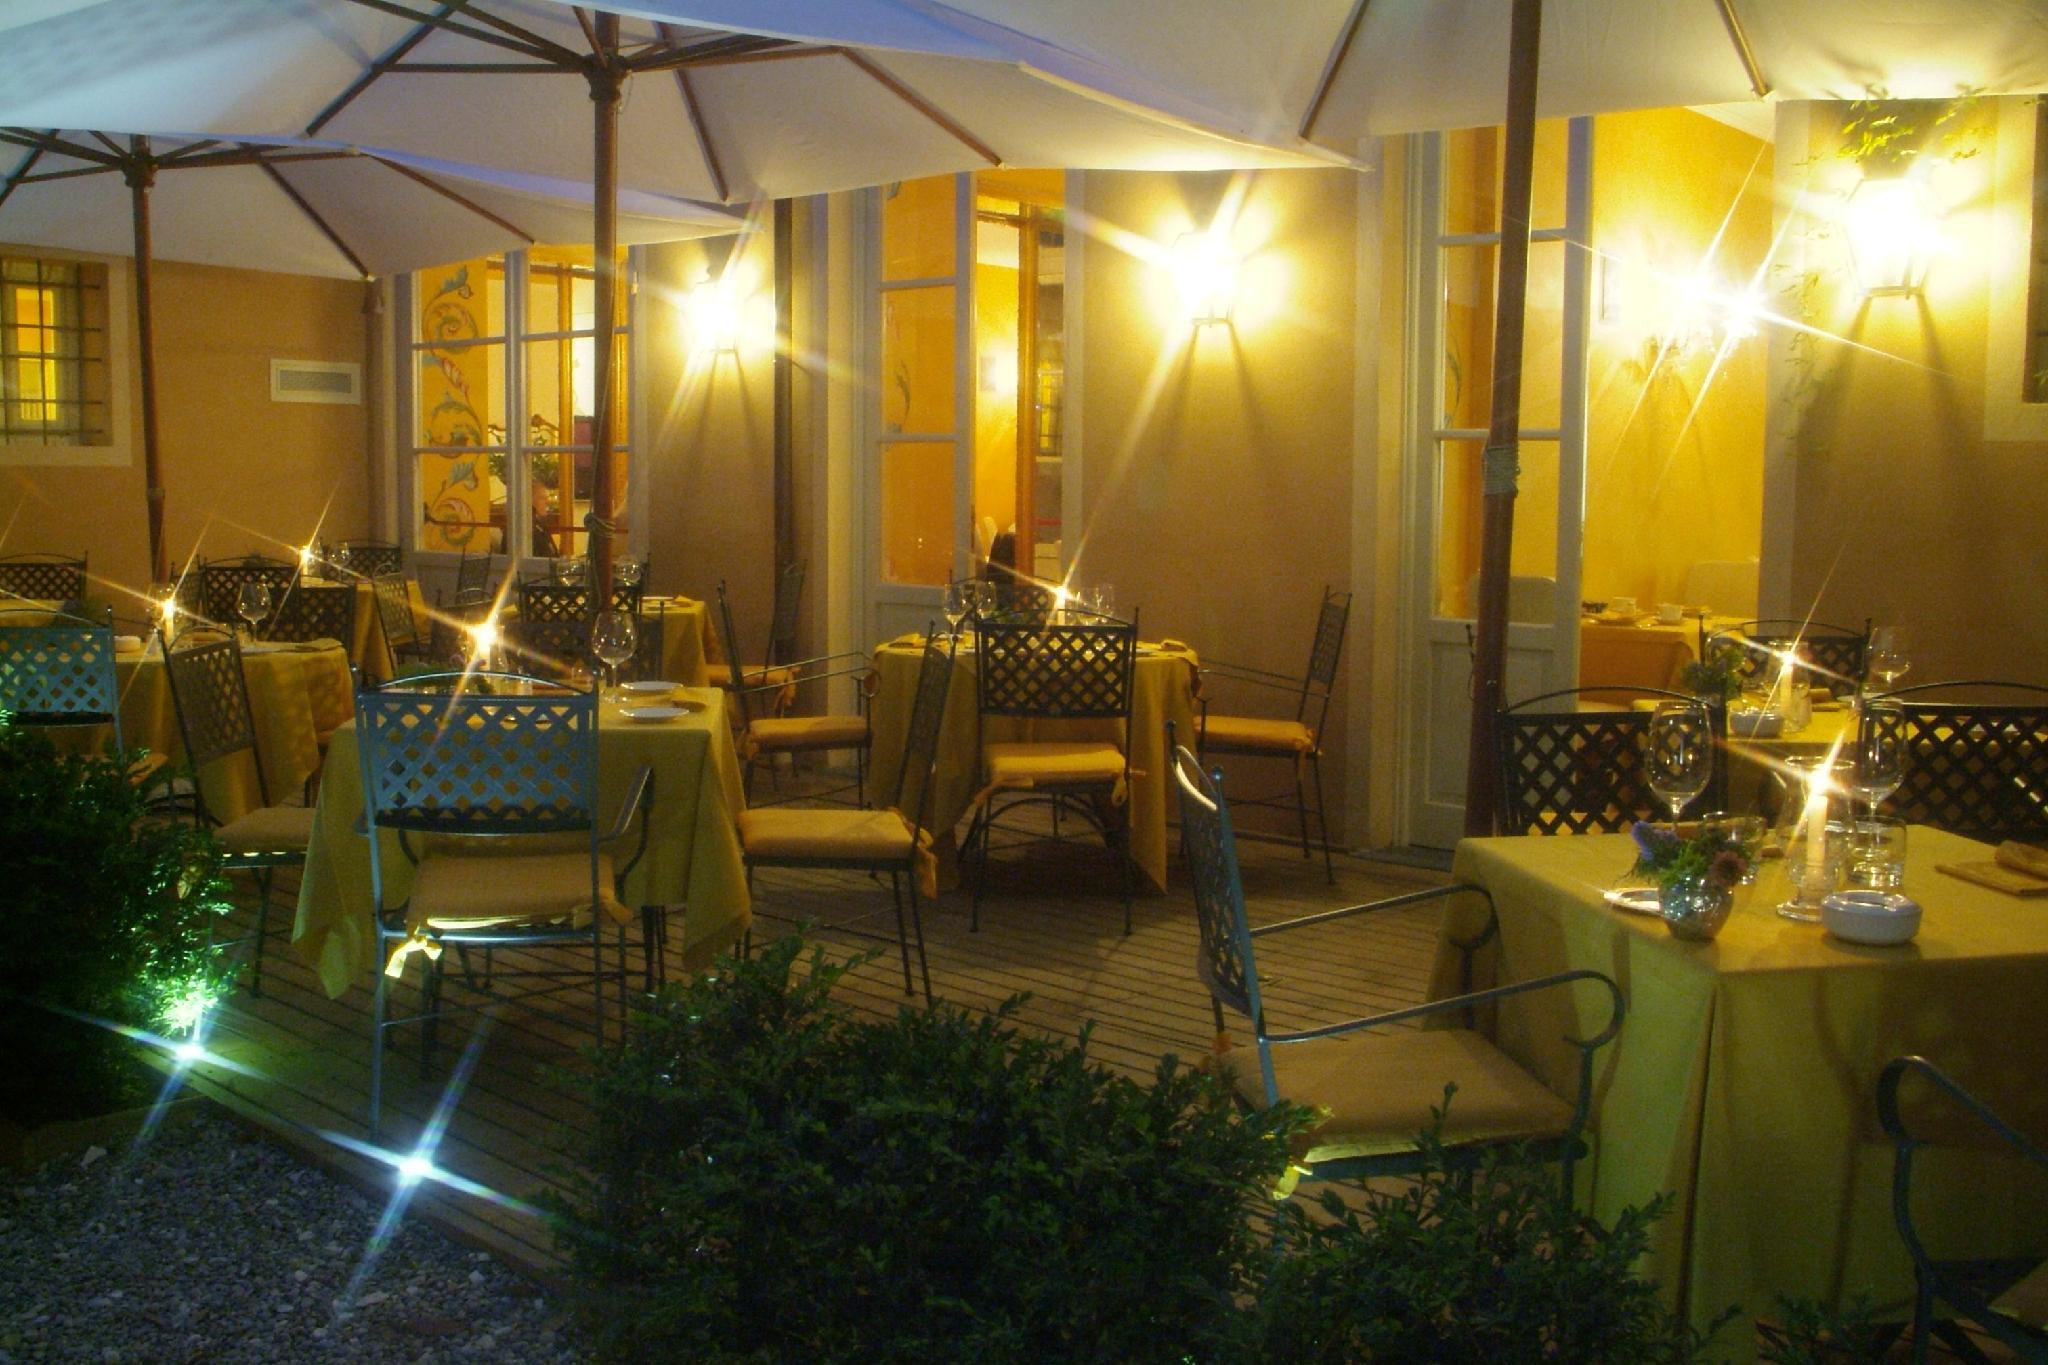 The Tuscanian Hotel